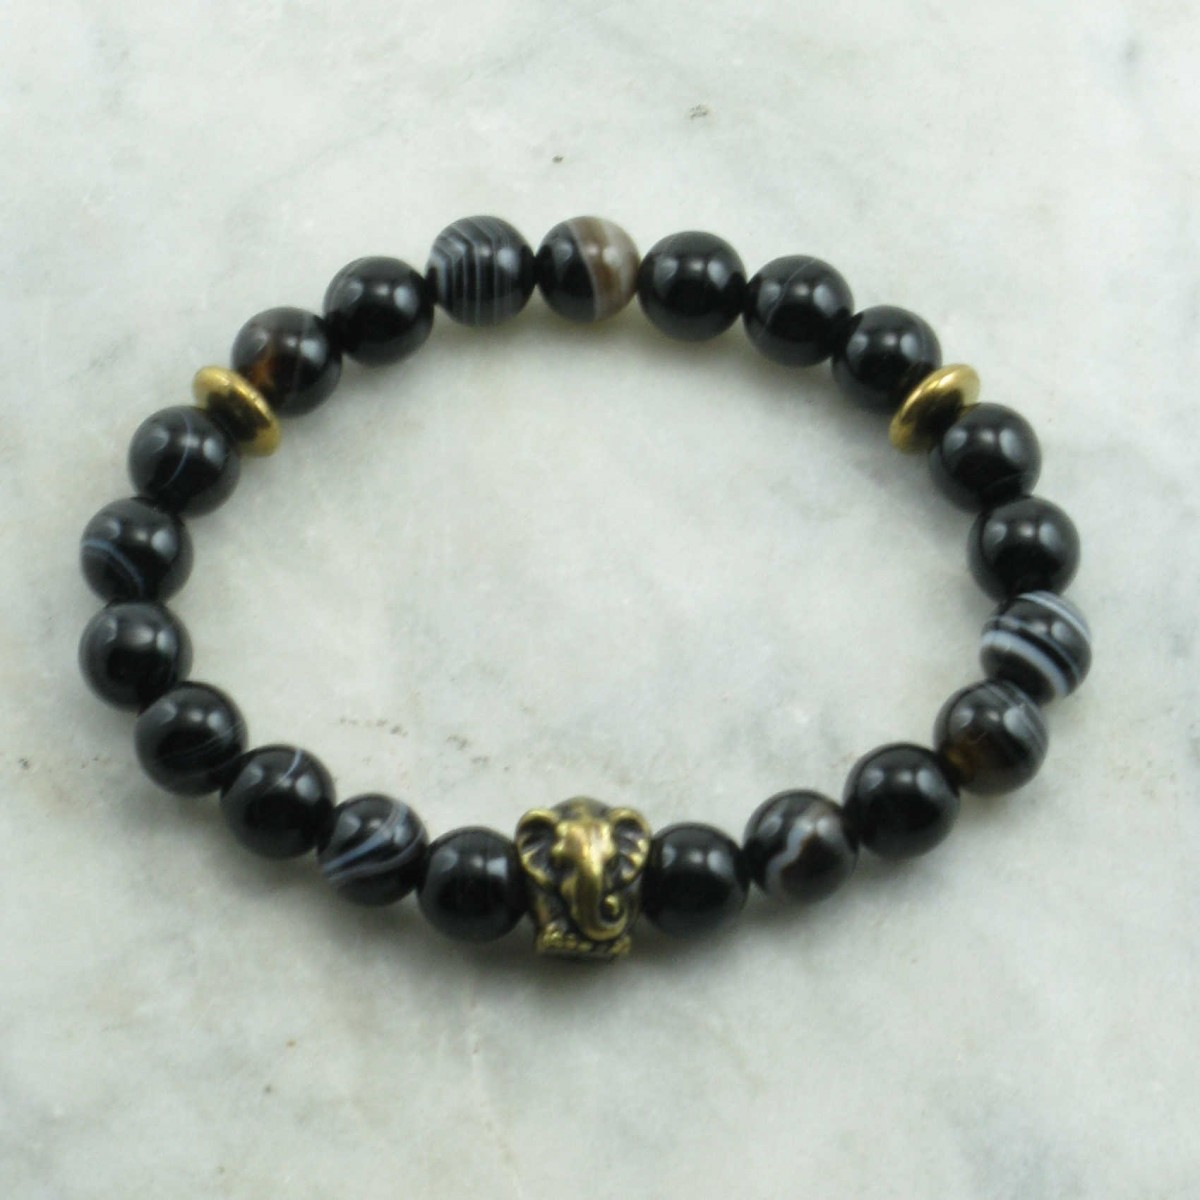 Moksha_Mala_Bracelet_21_Madagascar_Agate _Mala_Beads_Buddhist_Bracelet